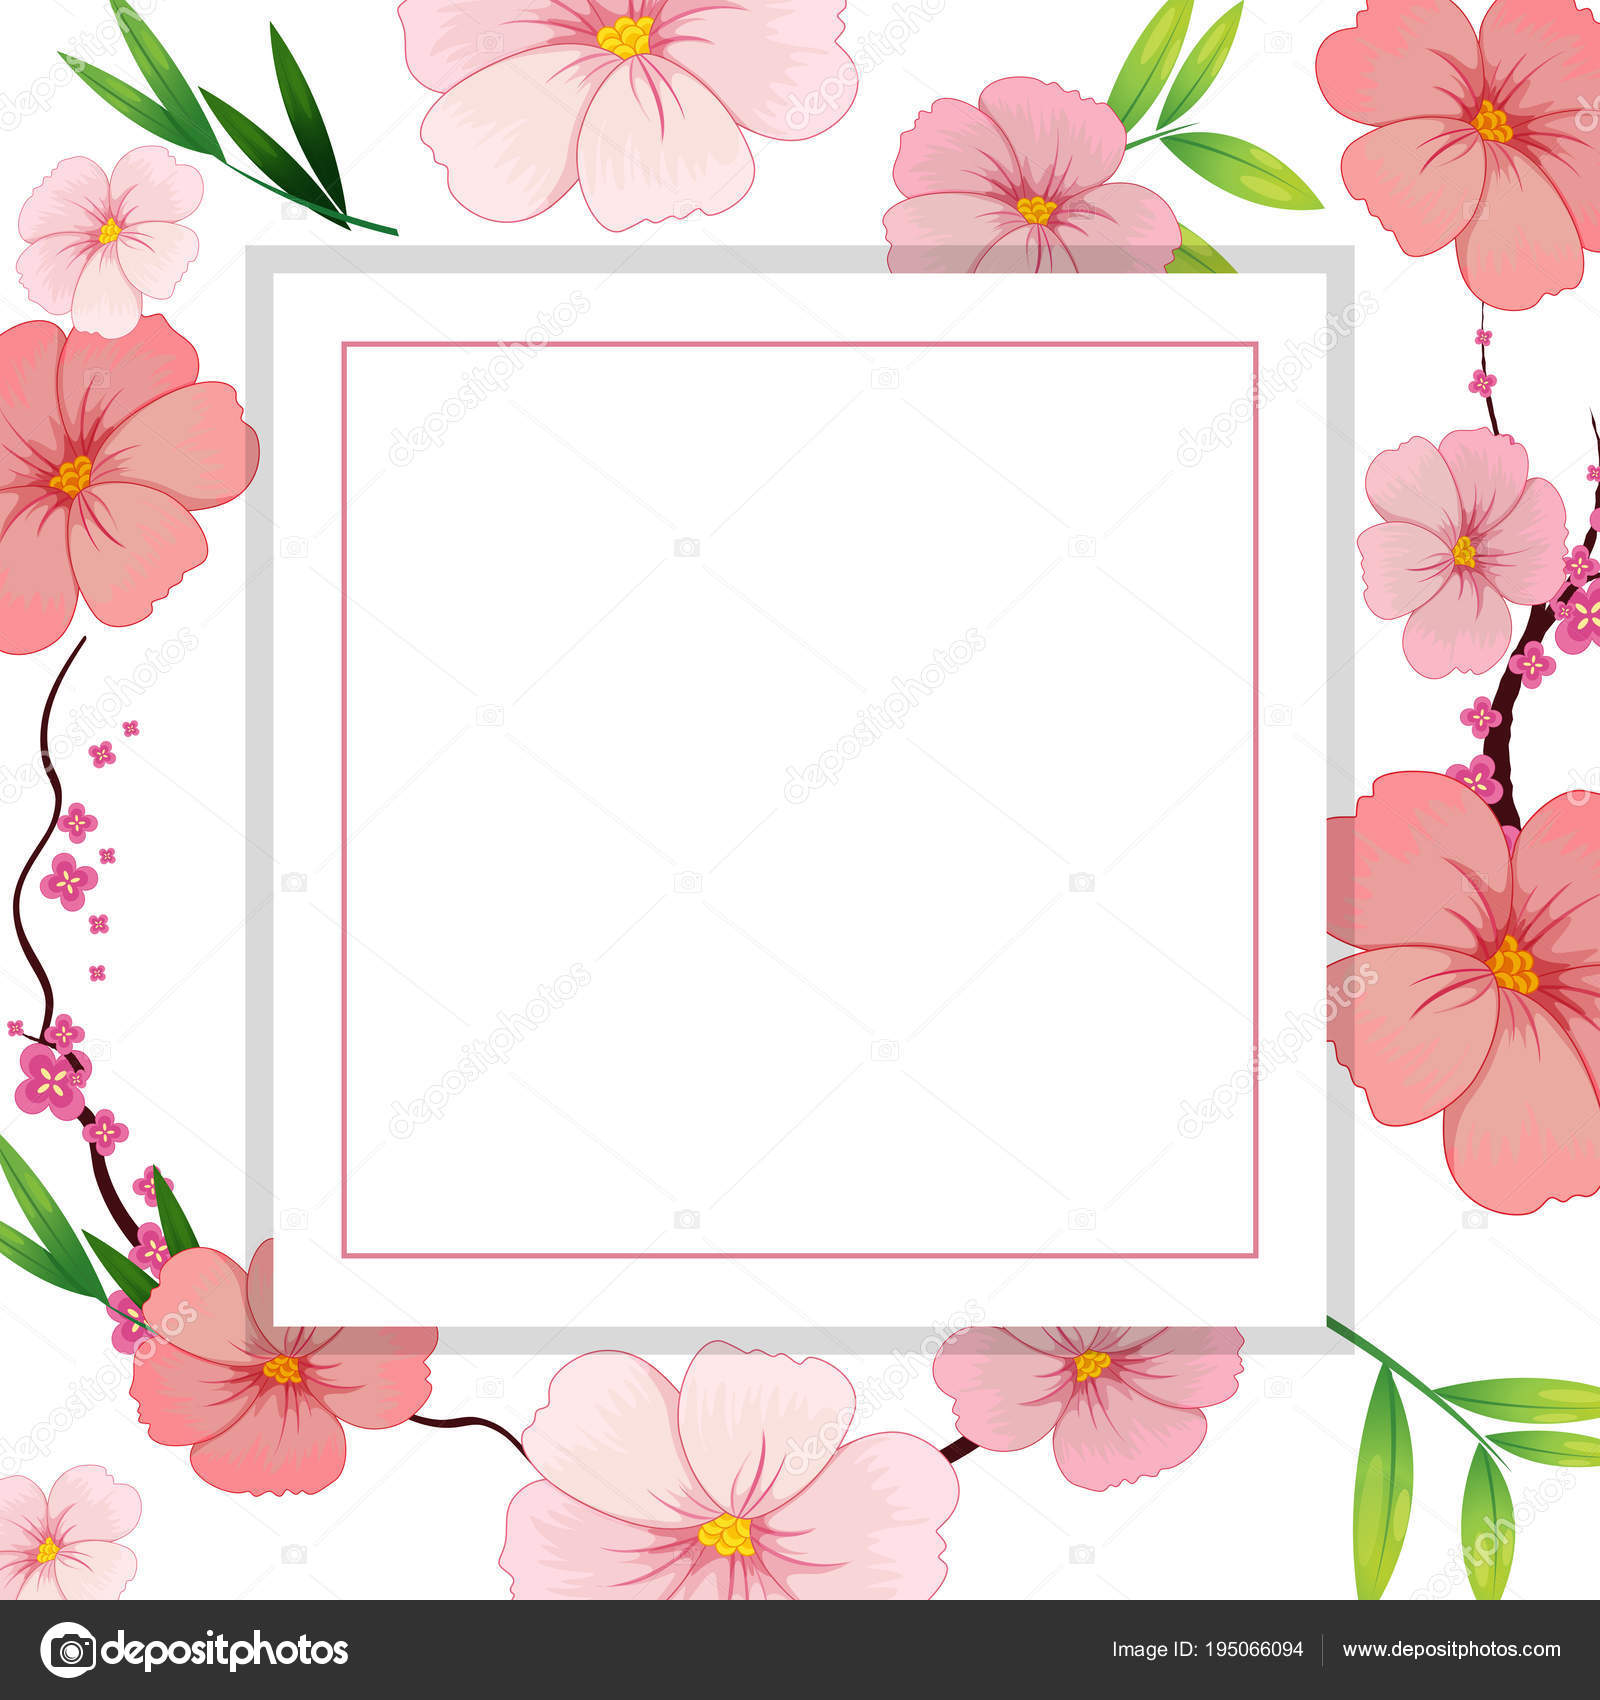 Beautiful pink hibiscus flower template stock vector beautiful pink hibiscus flower template illustration vector by interactimages izmirmasajfo